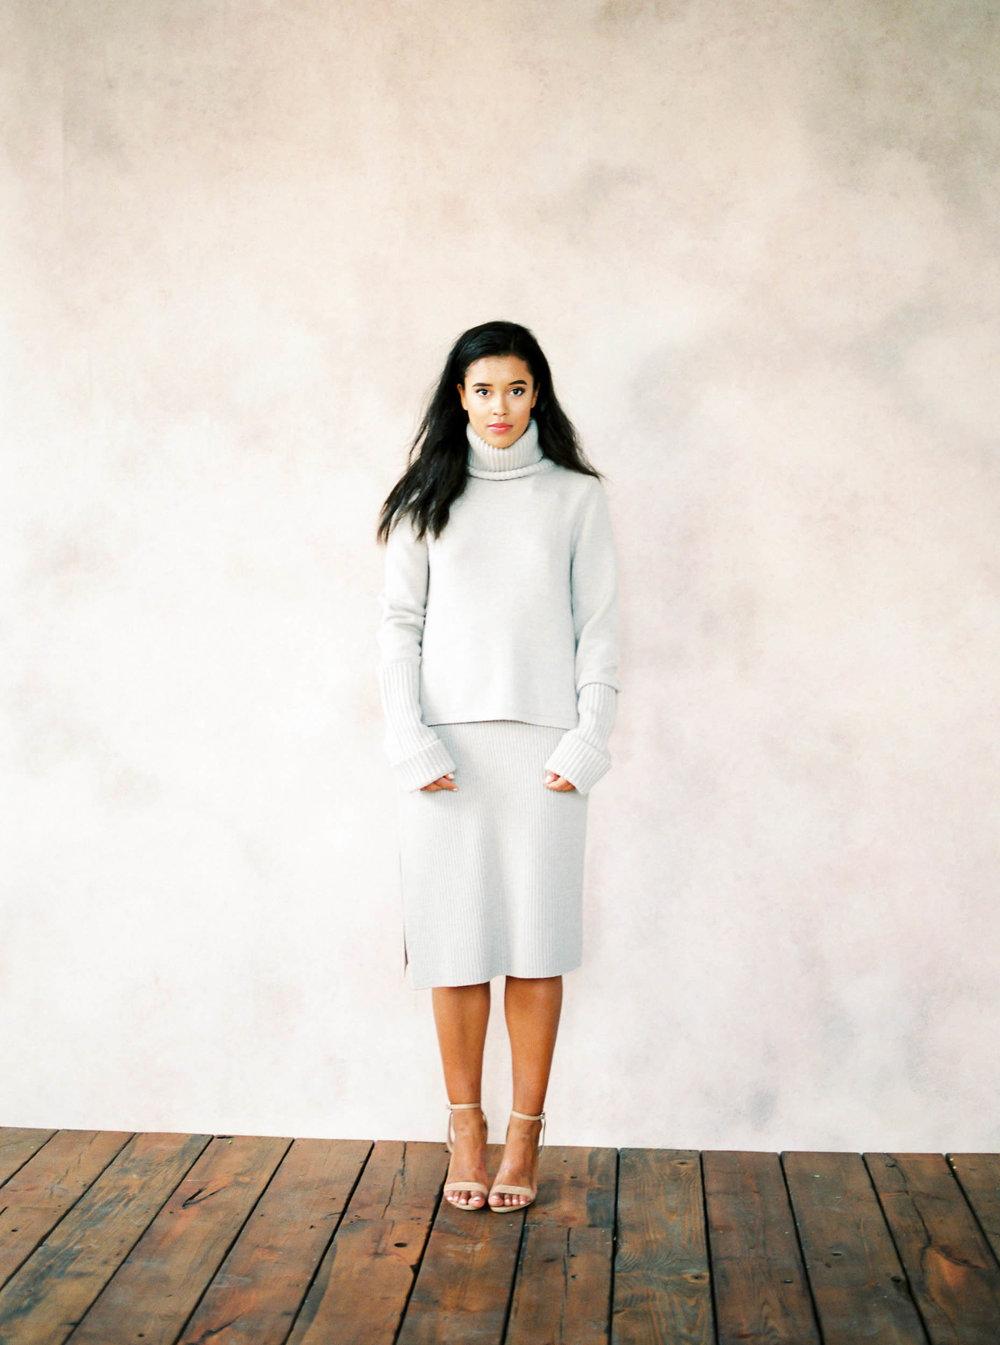 Amy O'Boyle Photography- Destination & UK Fine Art Film Wedding Photographer- London Editorial Fashion Shoot on Film-42.jpg